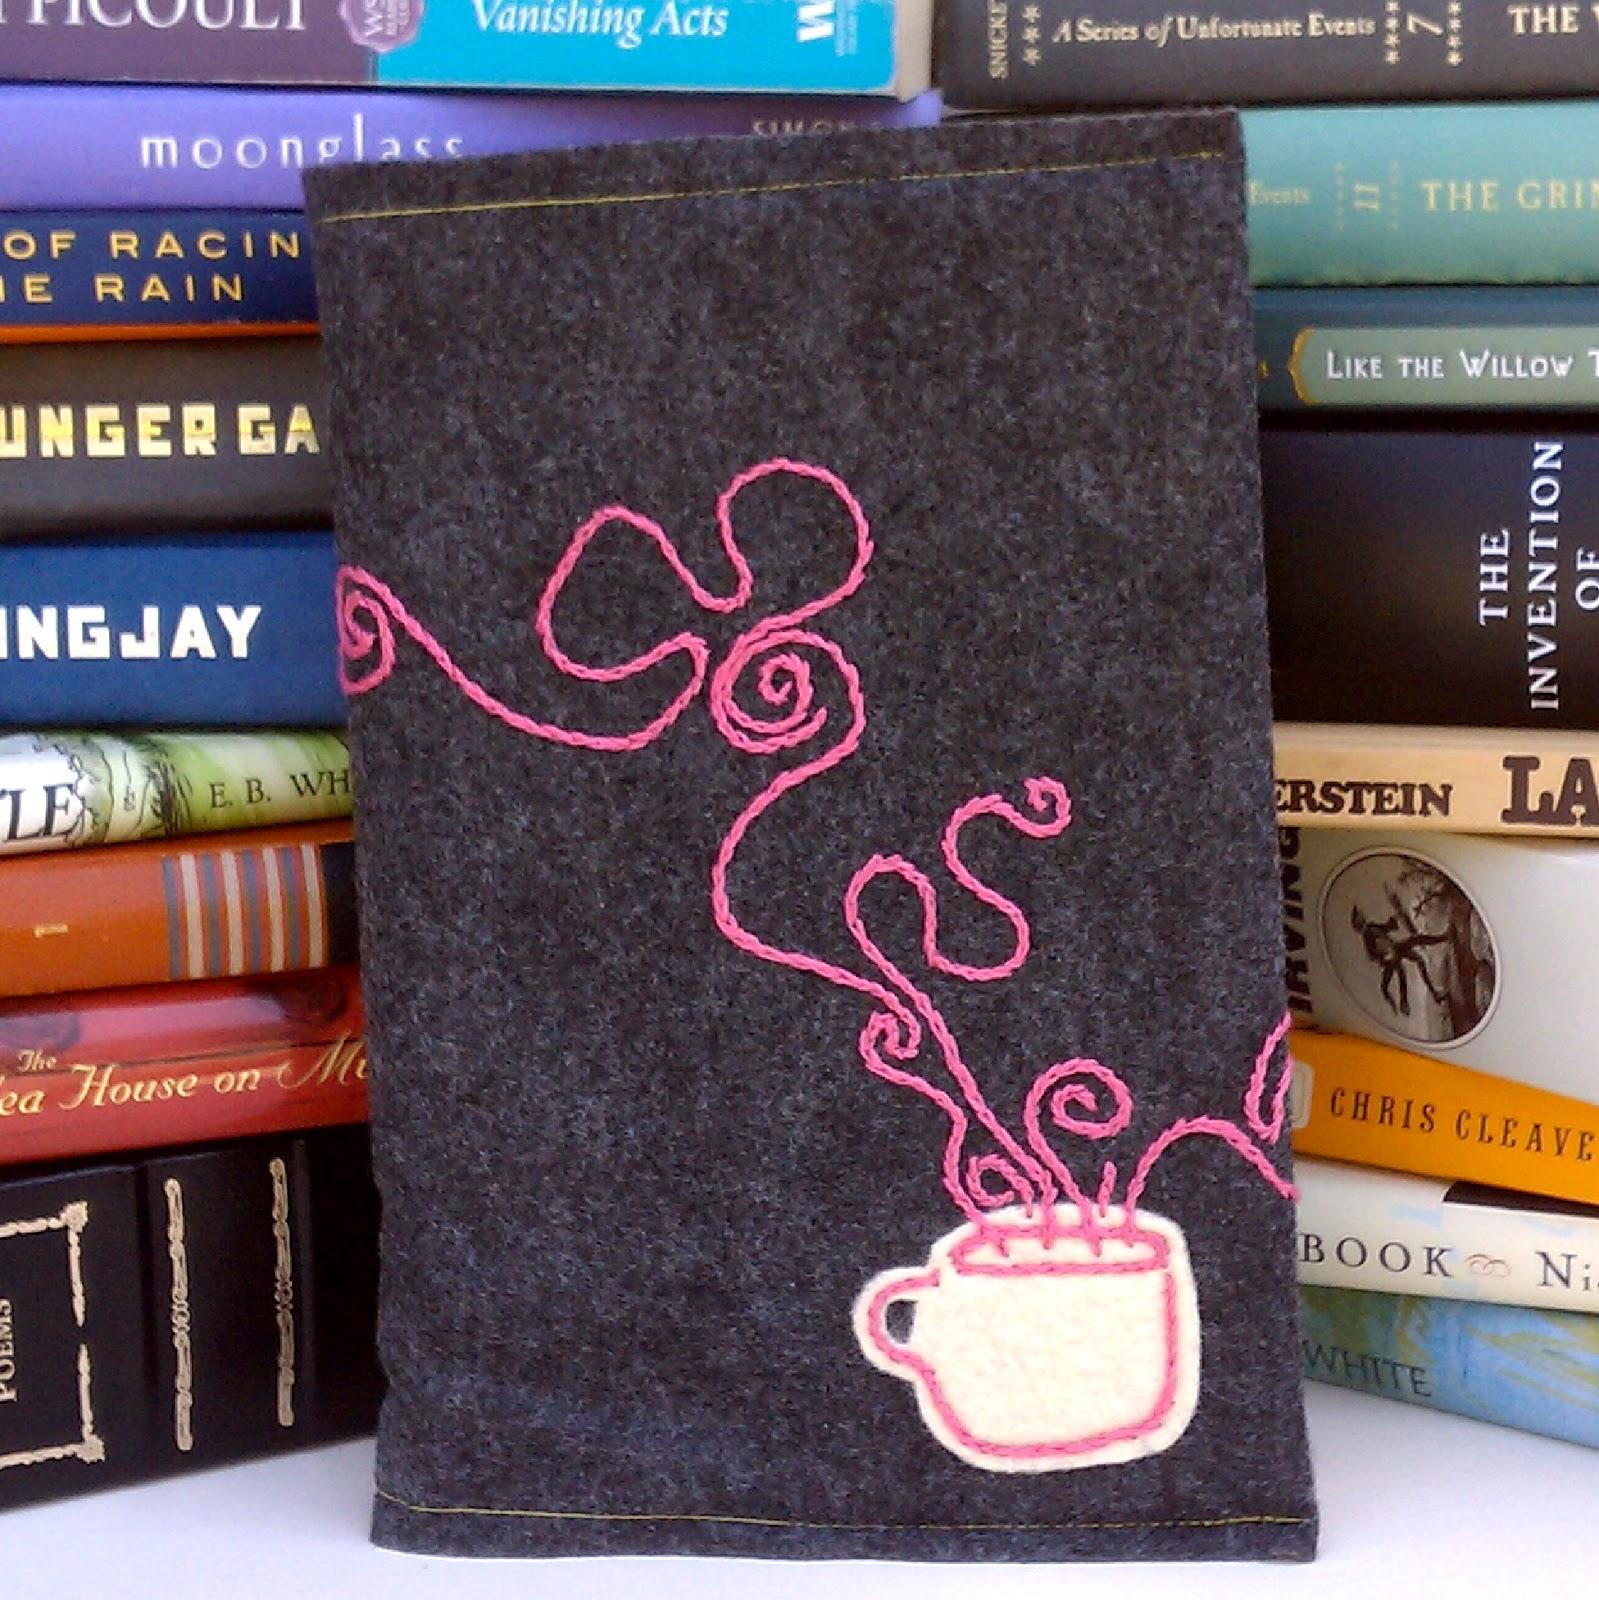 Old Yarn Girls Felt Book Covers From Old Yarn Girls